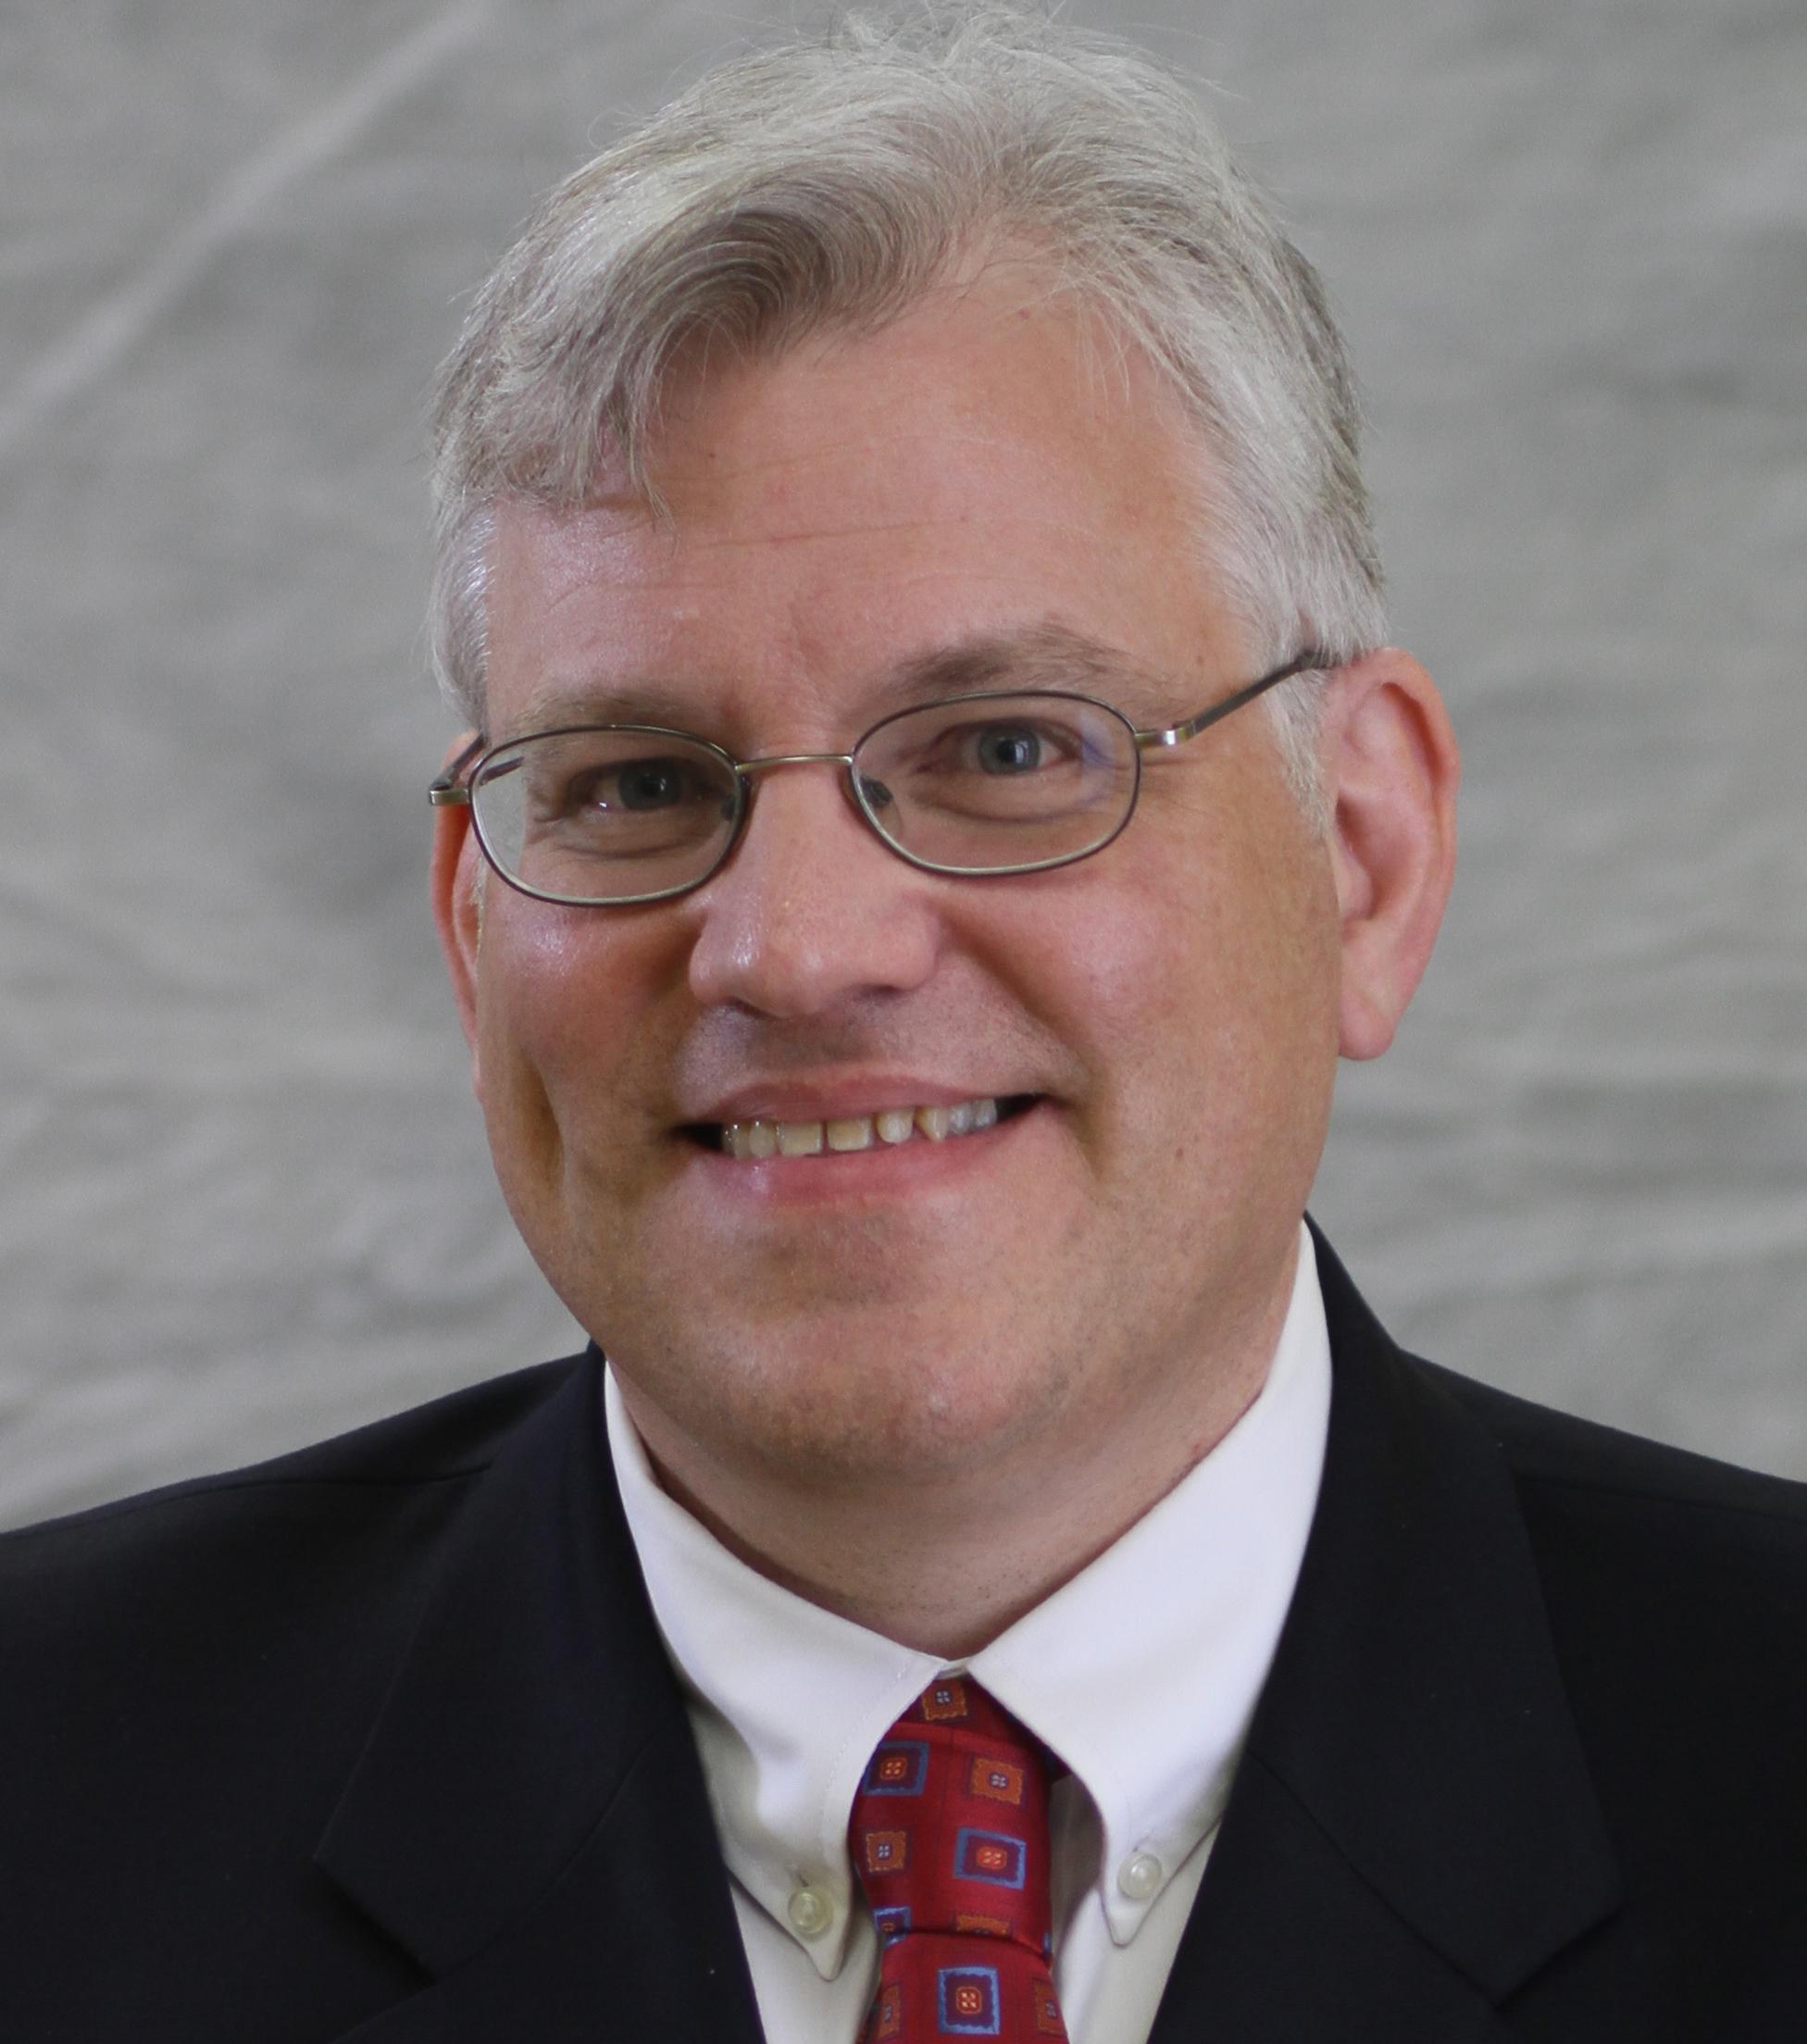 Dr. Kerry Fink